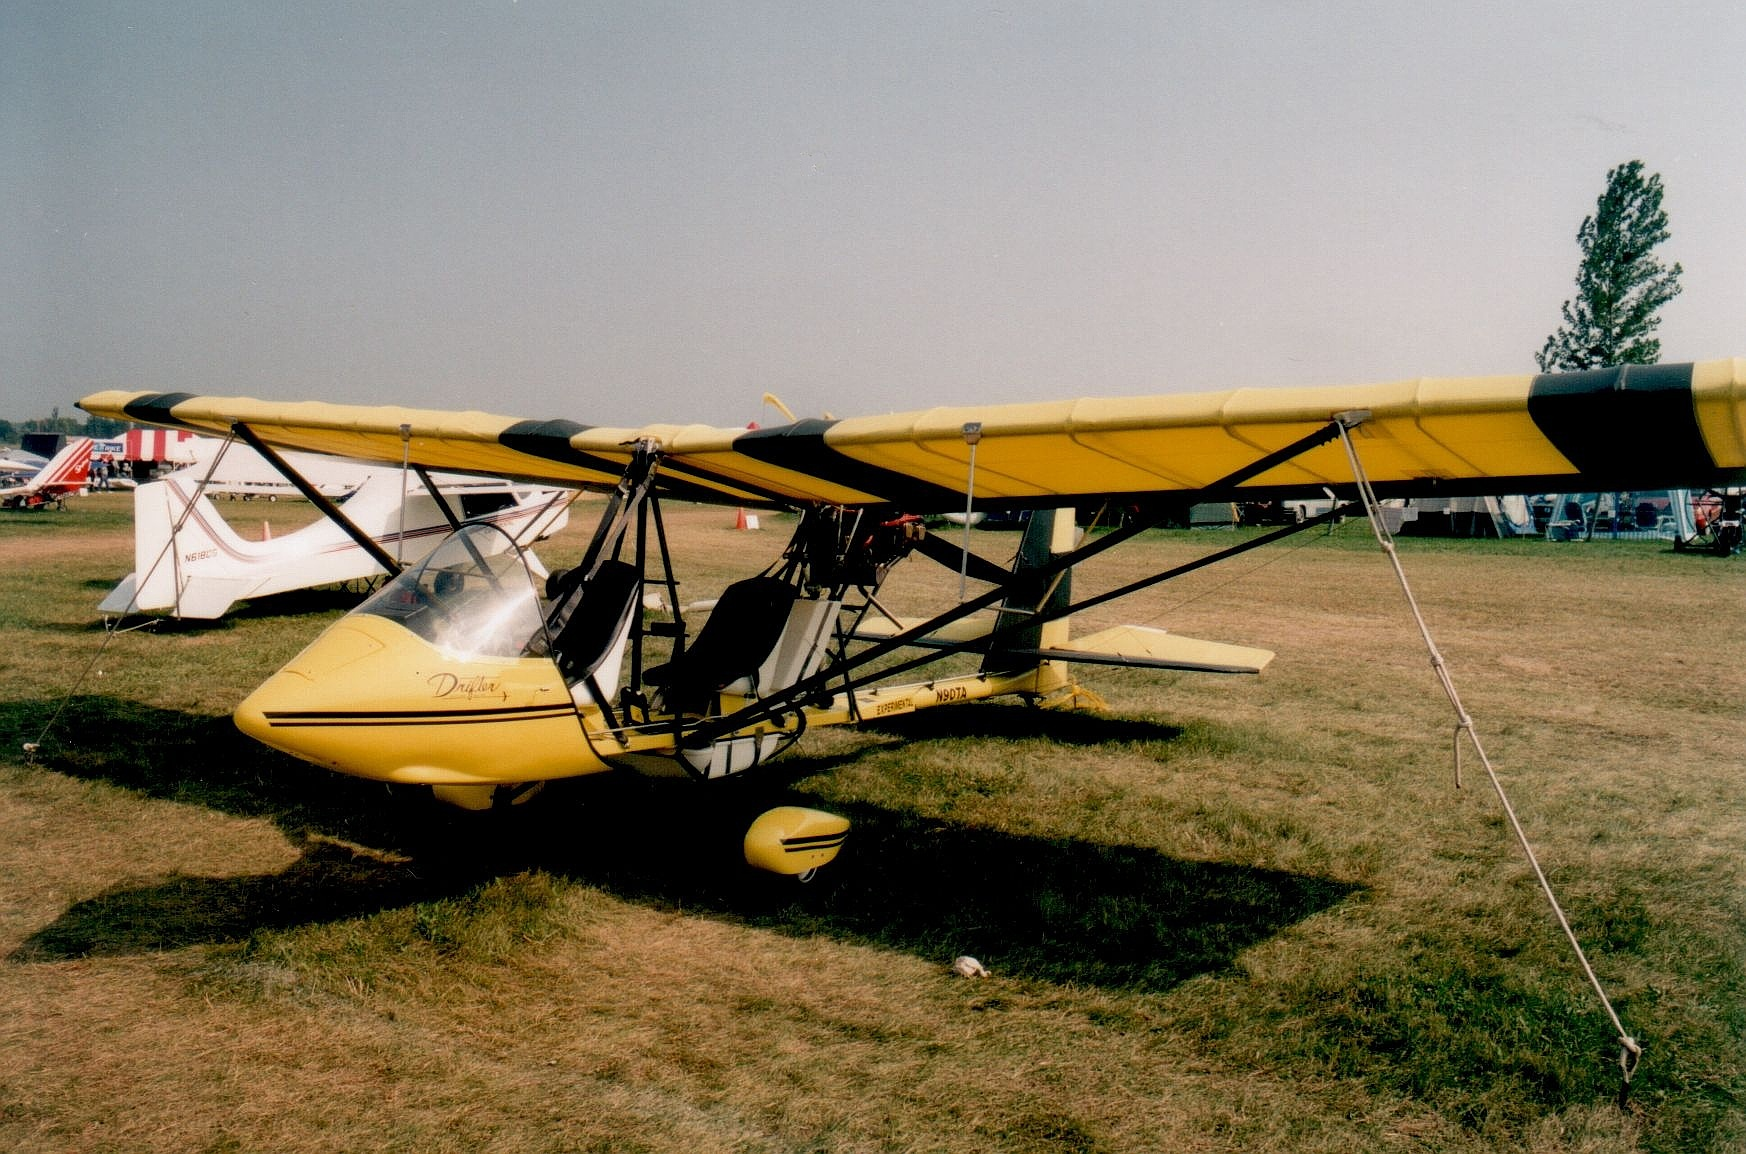 Kingston area plane crash